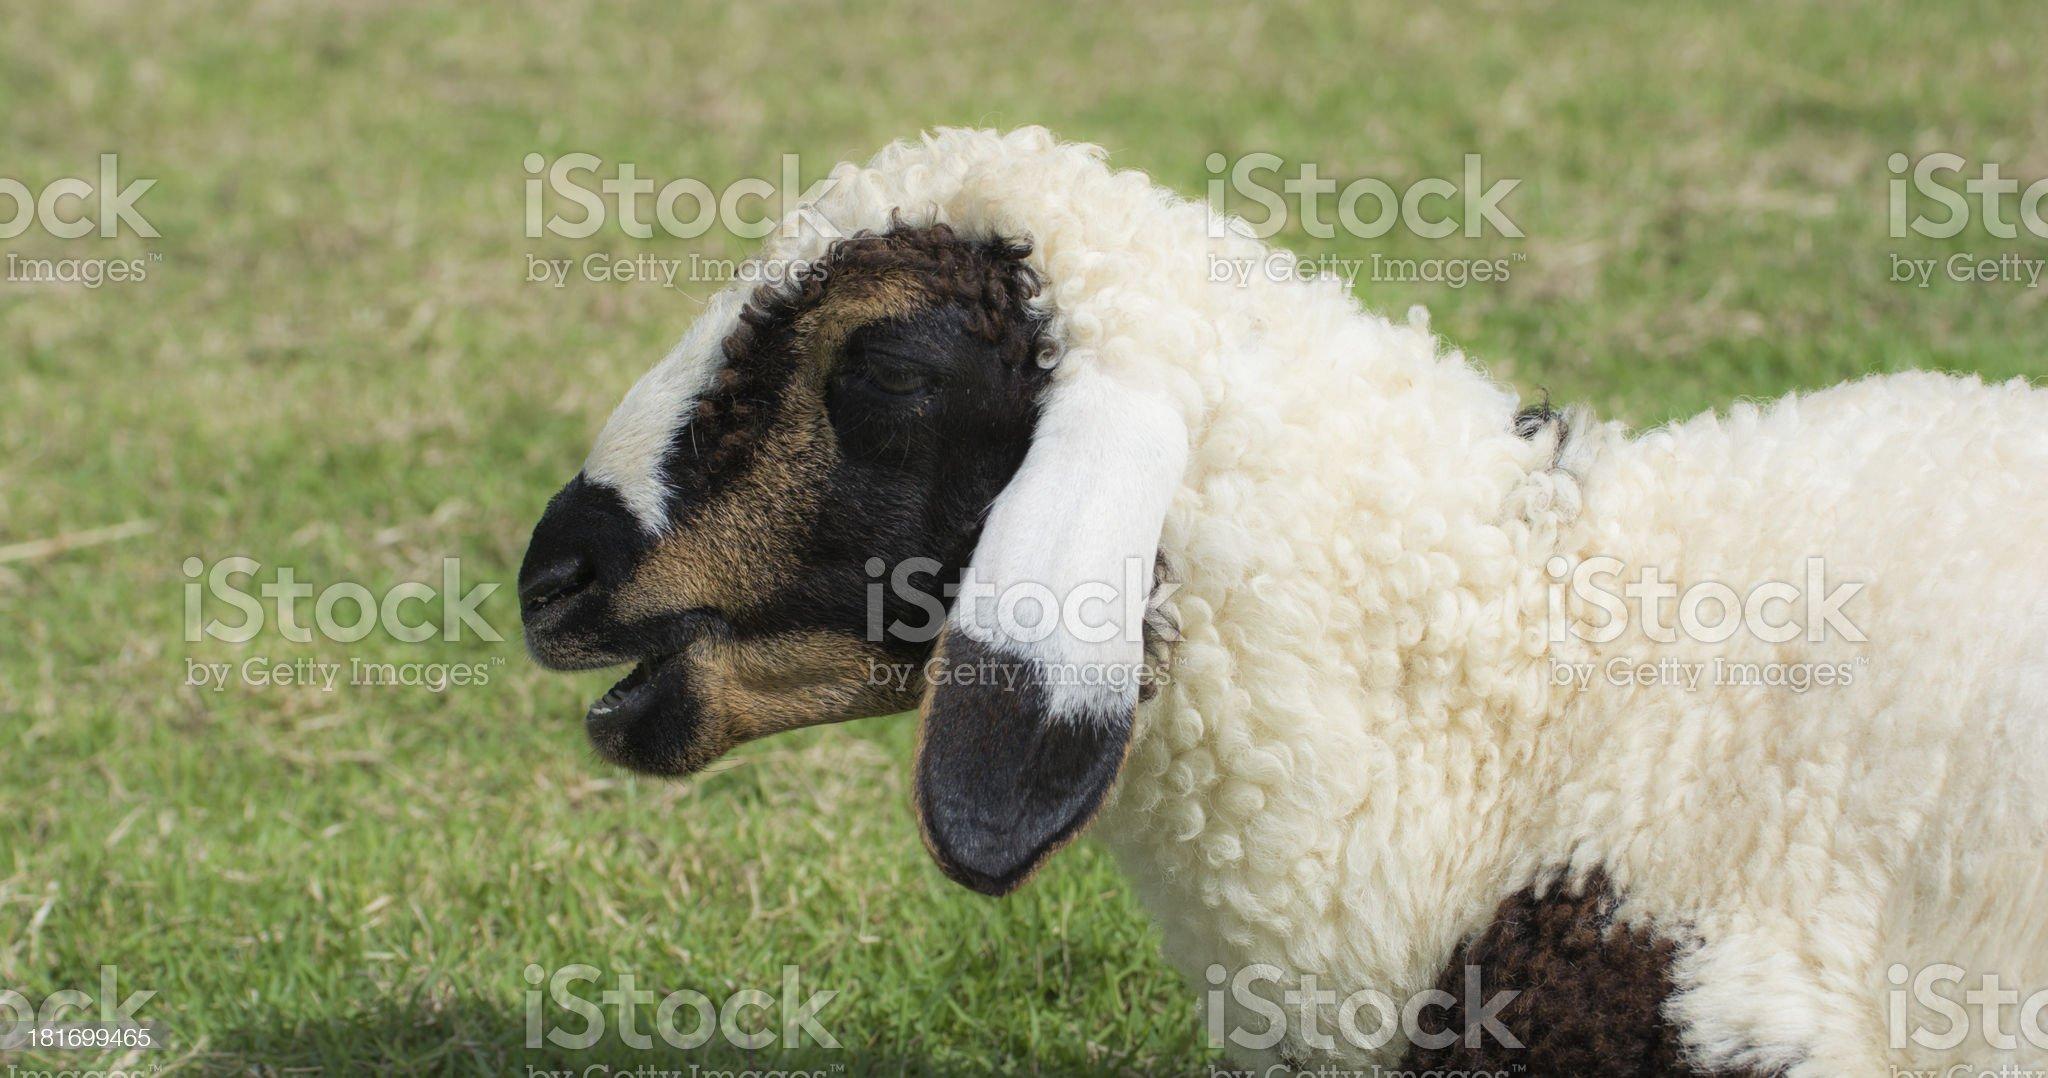 Sheep Farm royalty-free stock photo